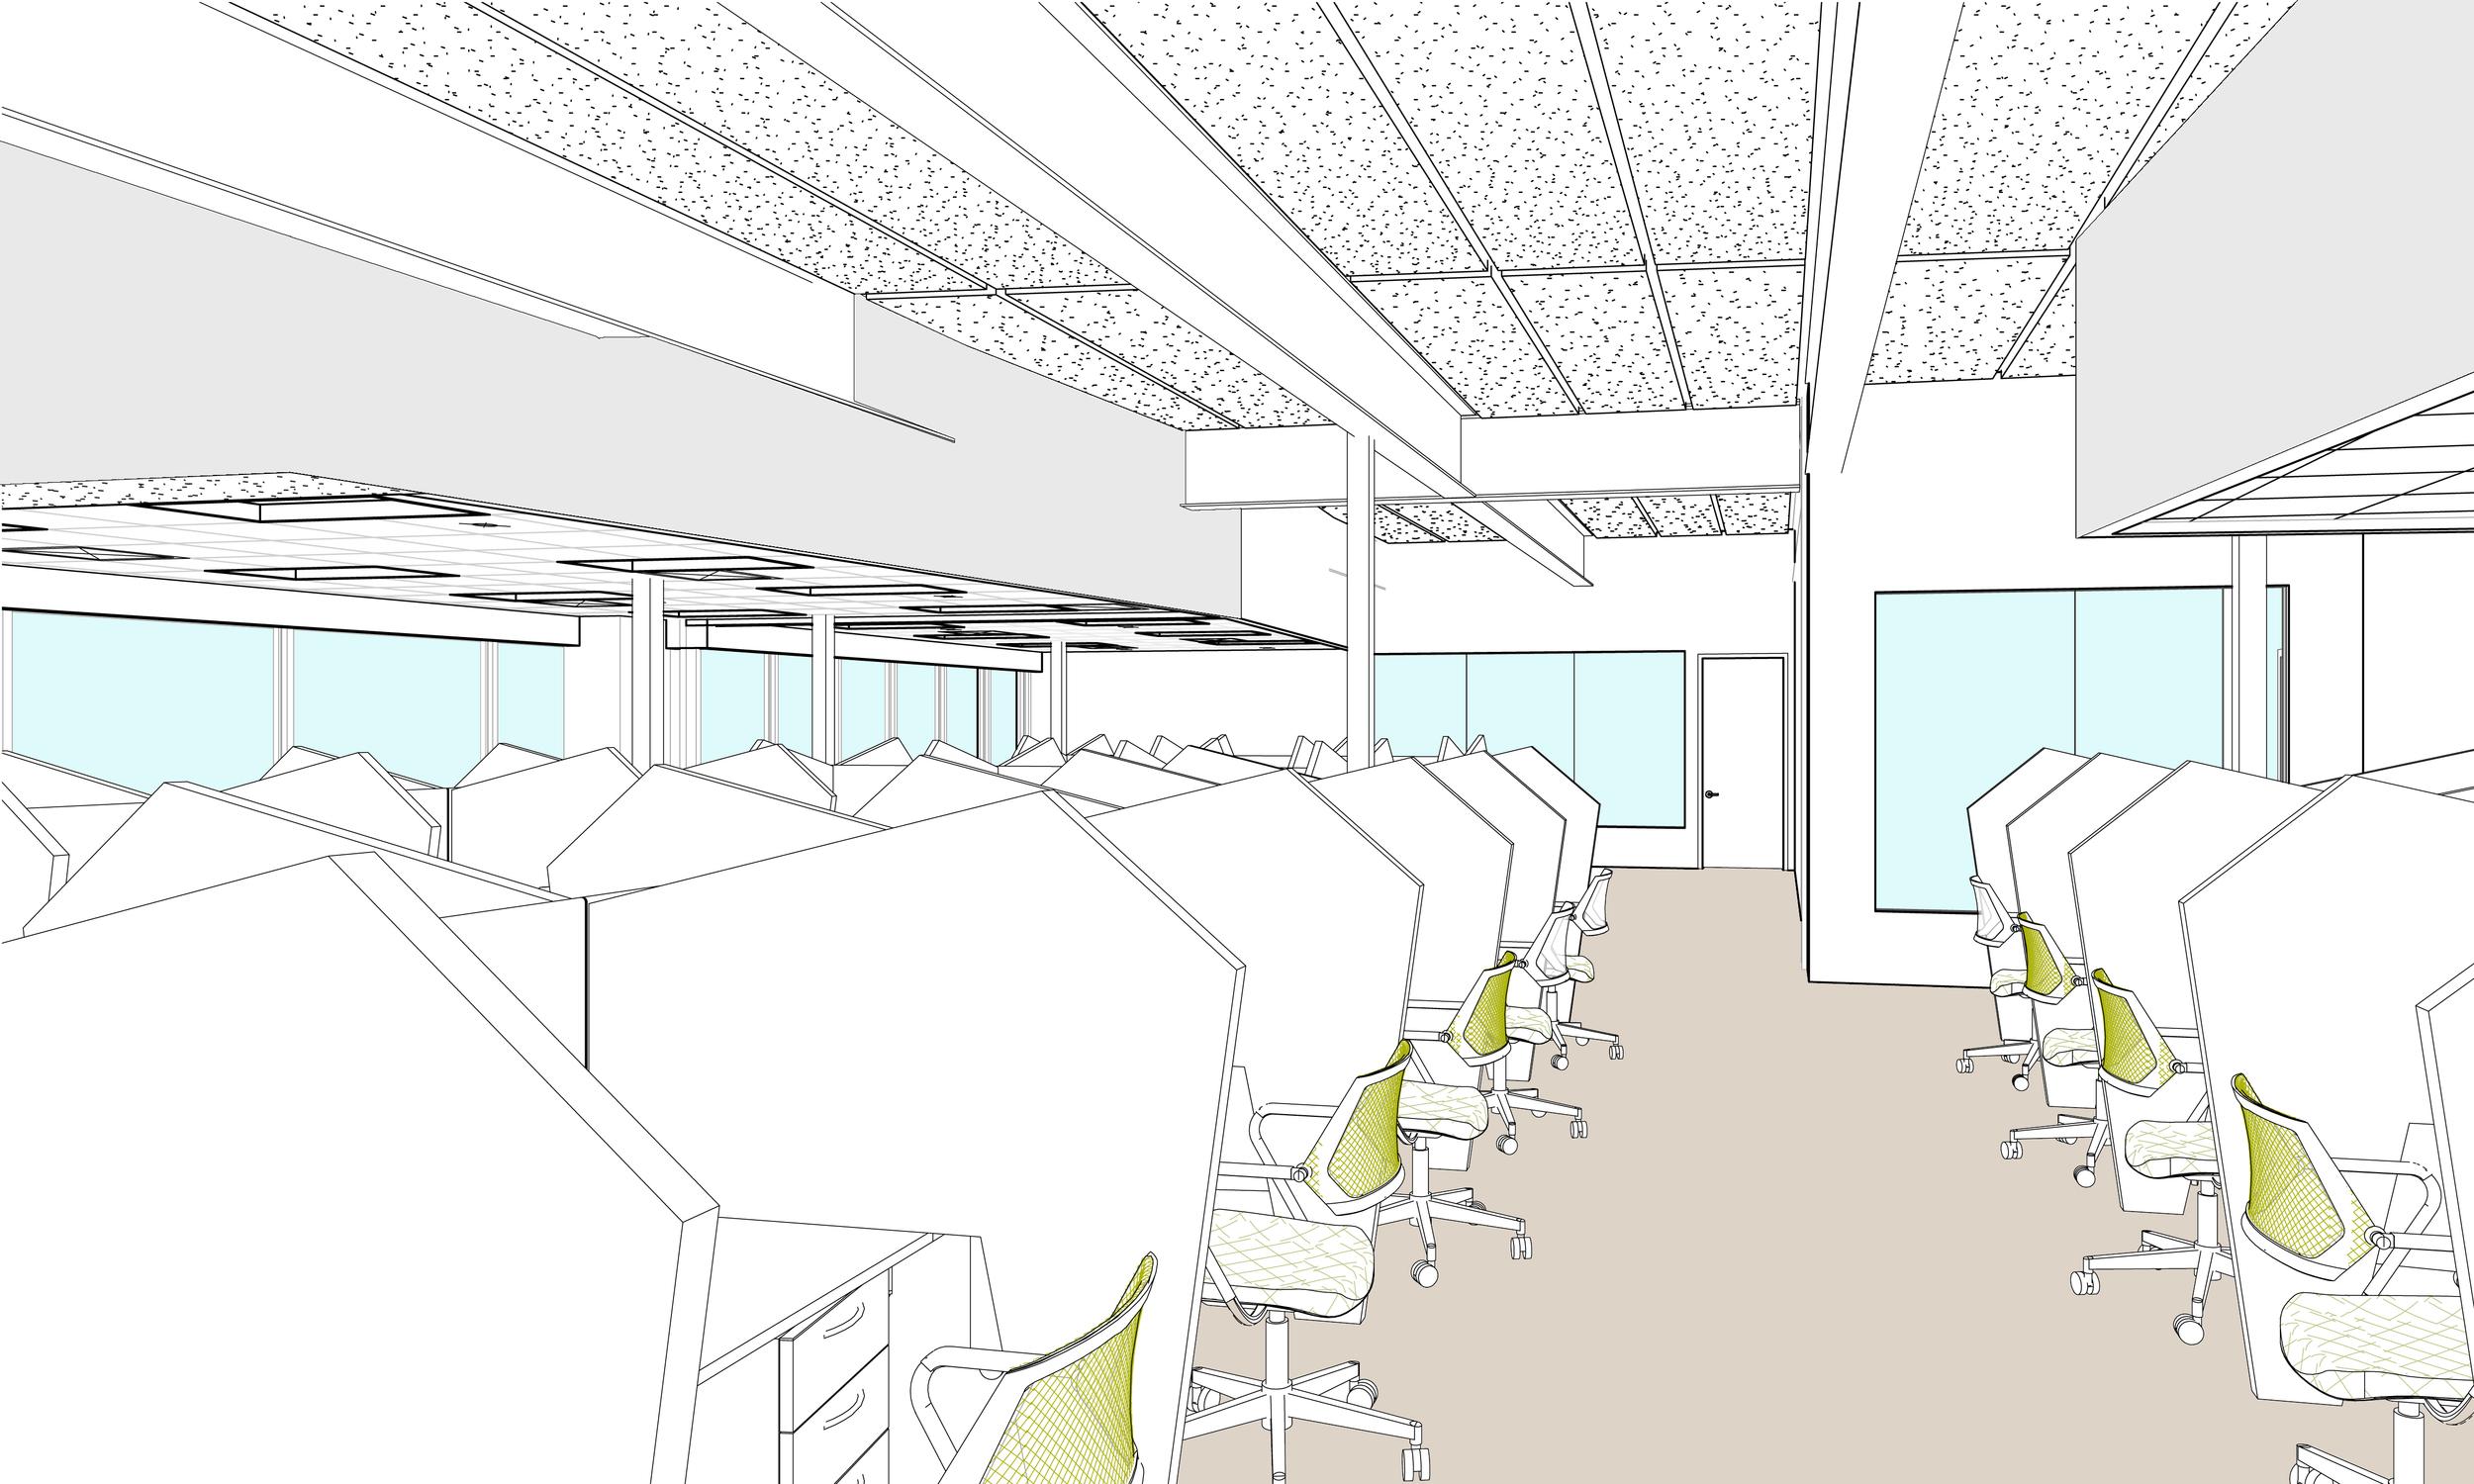 Concept Design for Customer Care area -